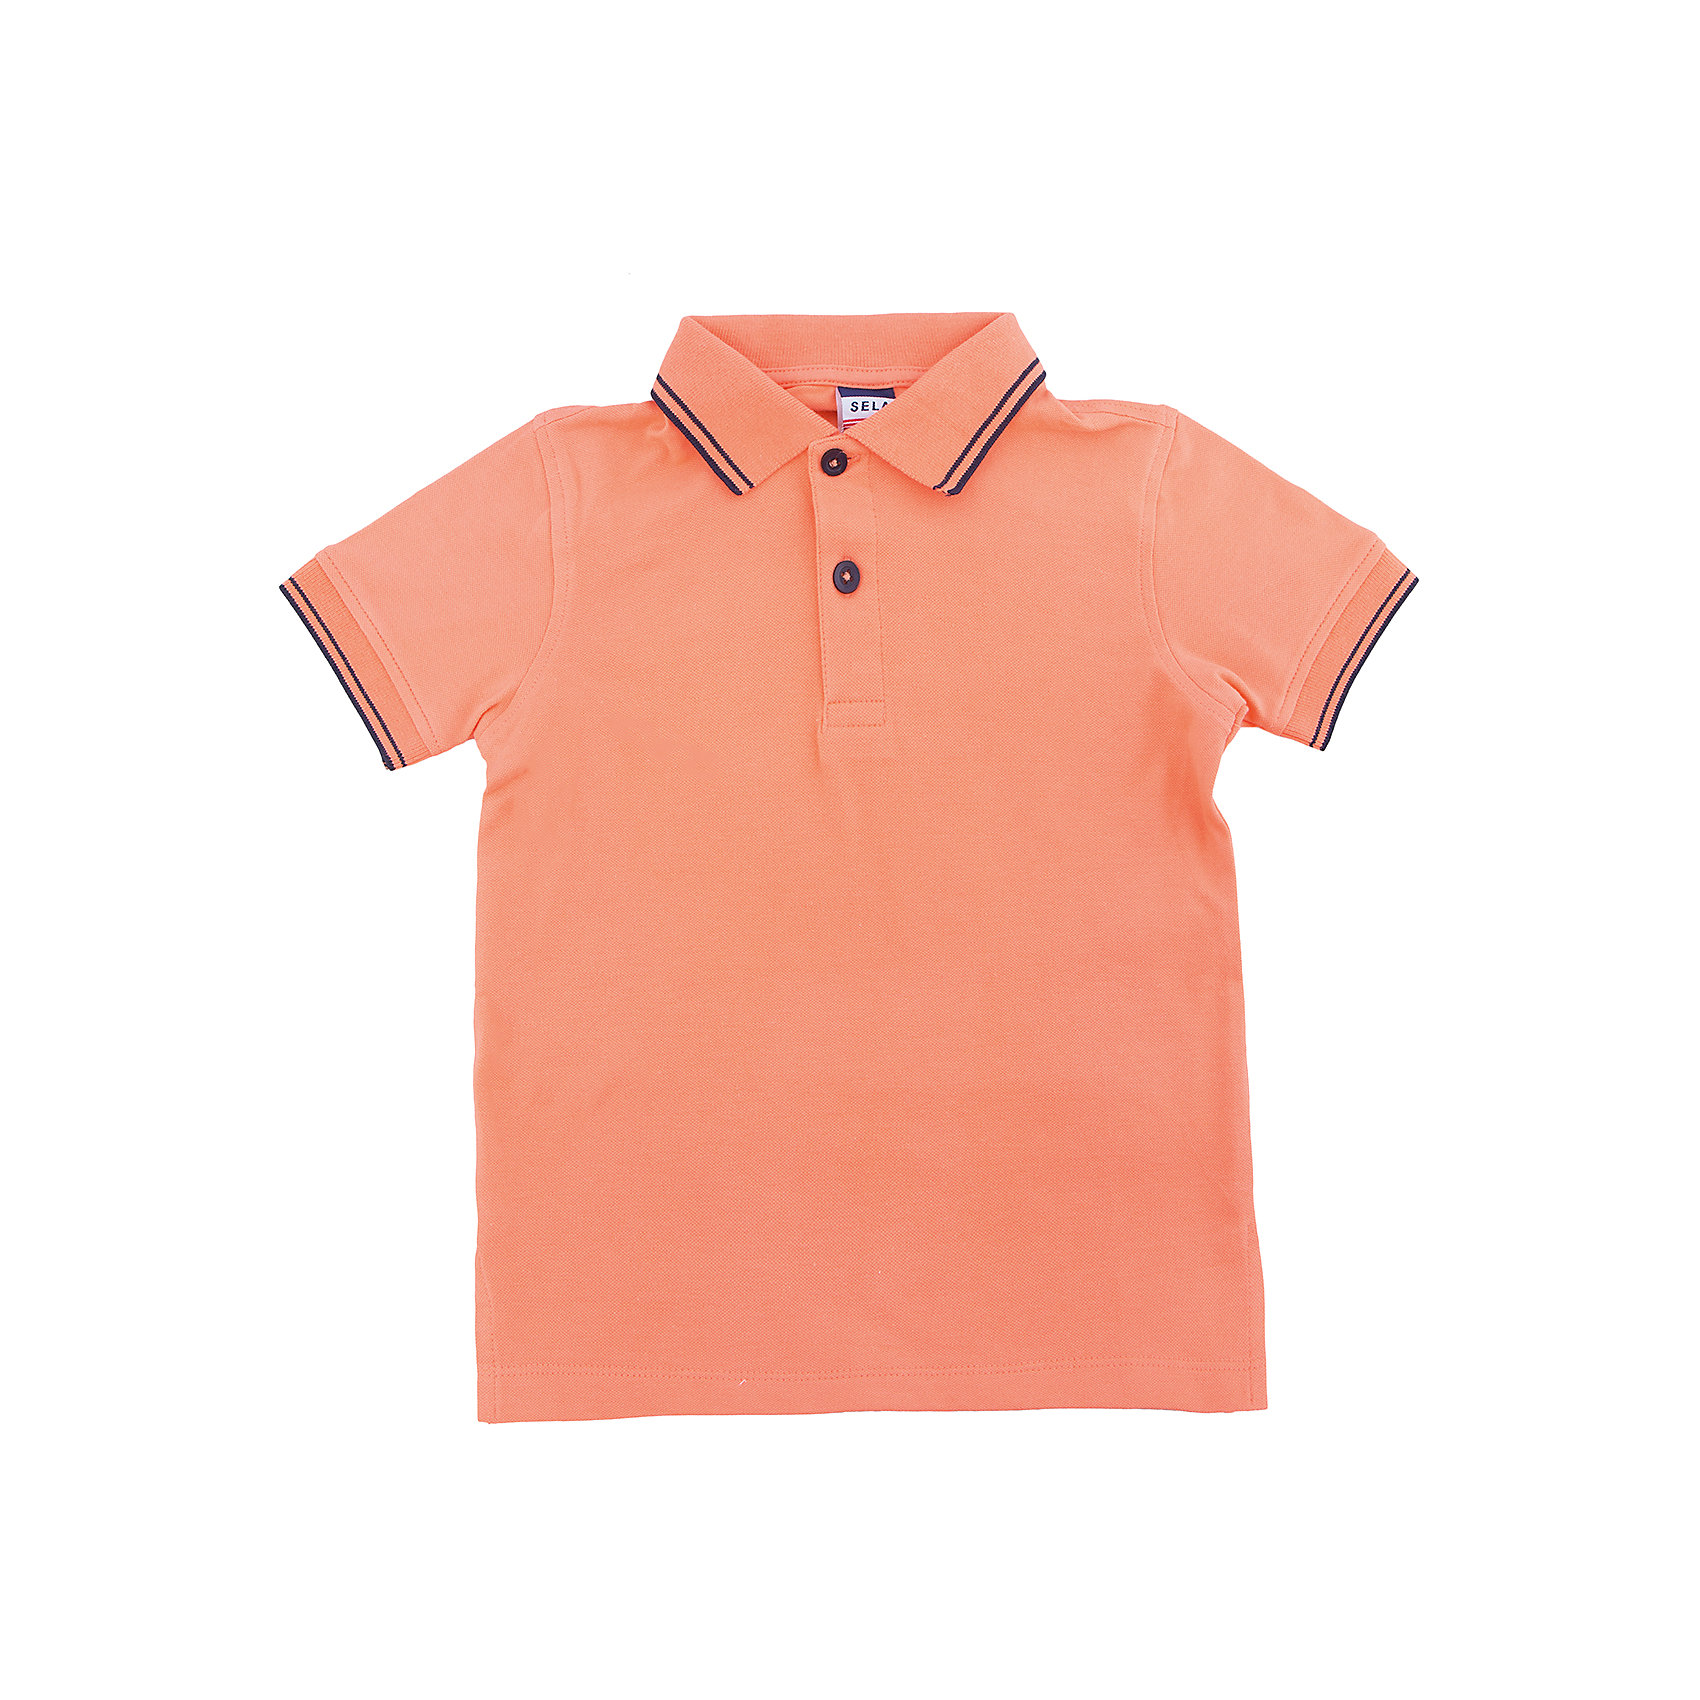 Рубашка для мальчика SELAРубашка для мальчика SELA<br>Состав:<br>95% хлопок, 5% эластан<br><br>Ширина мм: 174<br>Глубина мм: 10<br>Высота мм: 169<br>Вес г: 157<br>Цвет: оранжевый<br>Возраст от месяцев: 48<br>Возраст до месяцев: 60<br>Пол: Мужской<br>Возраст: Детский<br>Размер: 110,98,92,104,116<br>SKU: 5304722